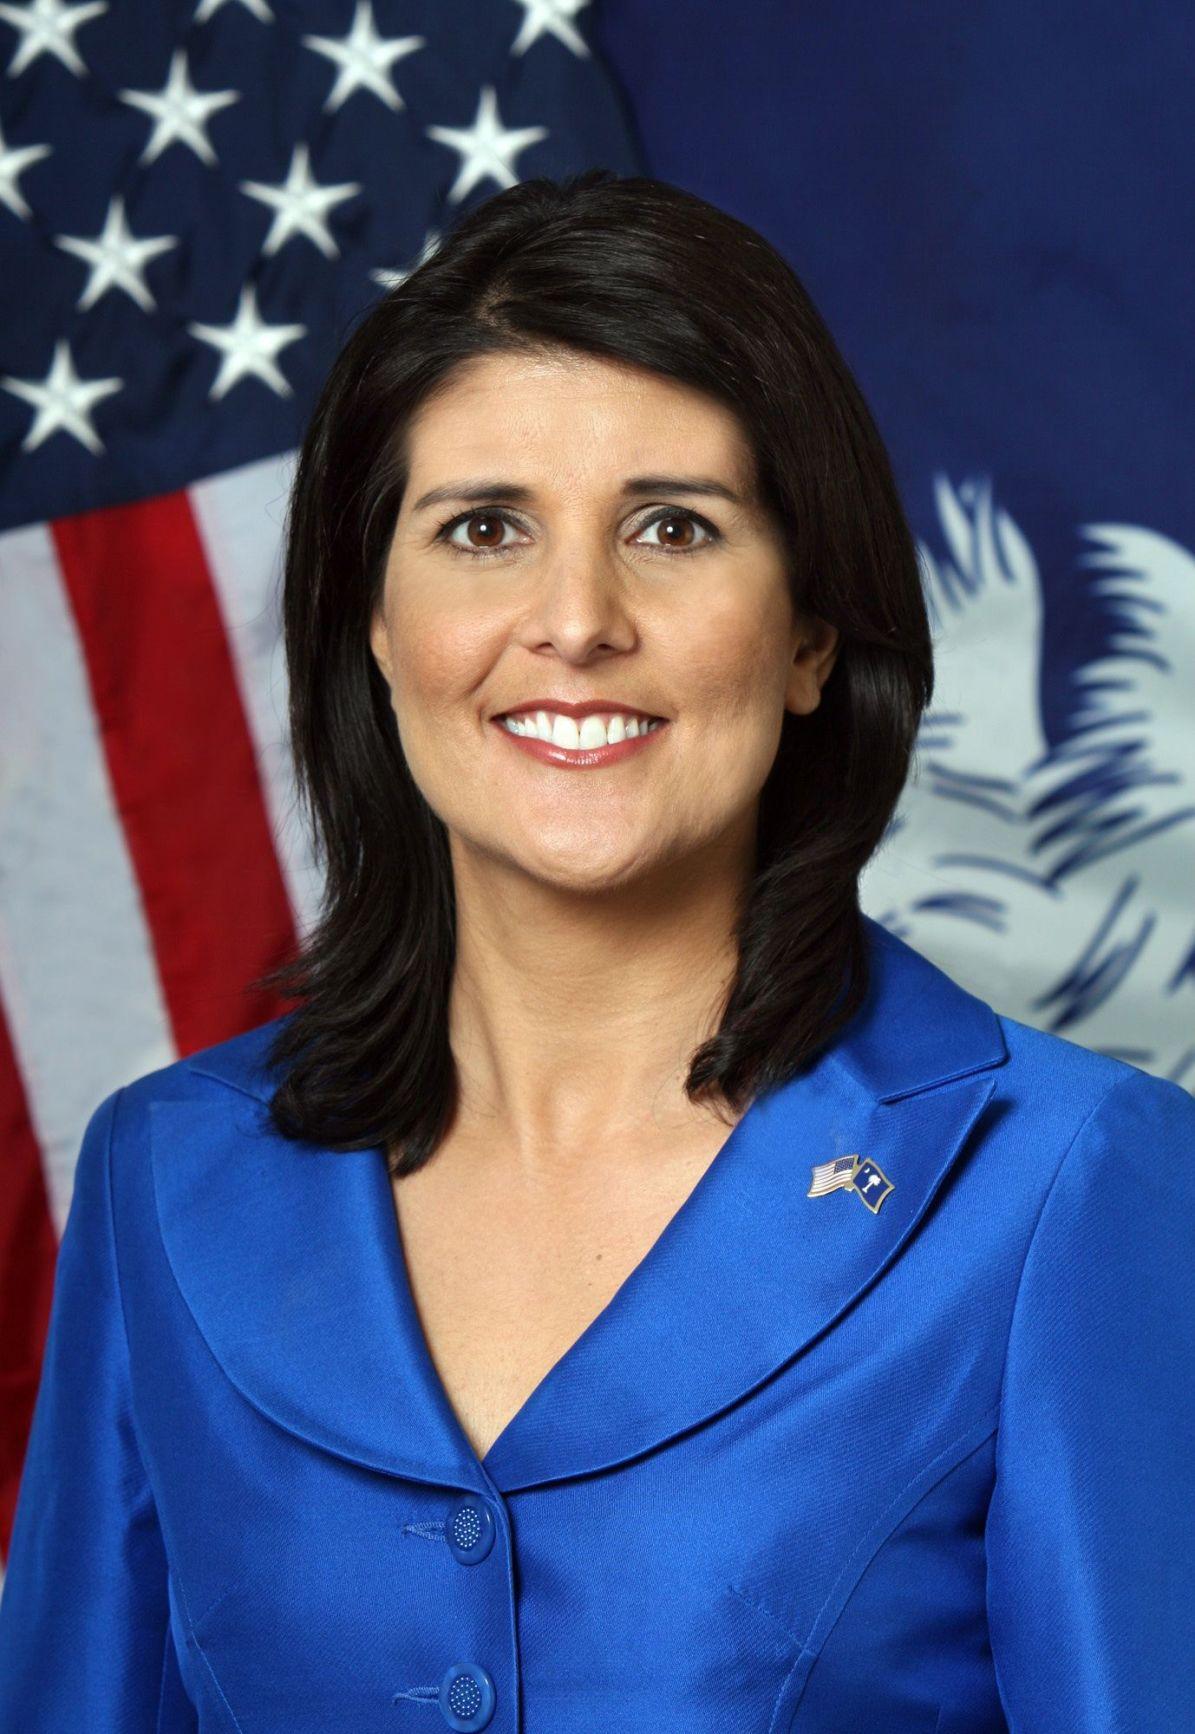 Haley announces 304 jobs in 5 rural S.C. counties